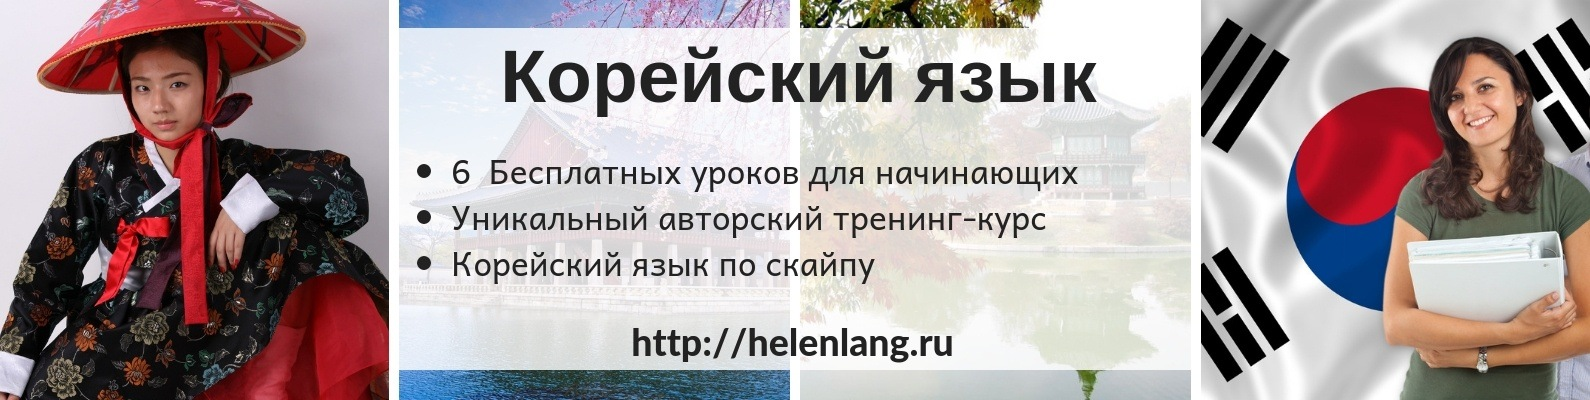 a320be6b3b4a0 Корейский язык | ВКонтакте